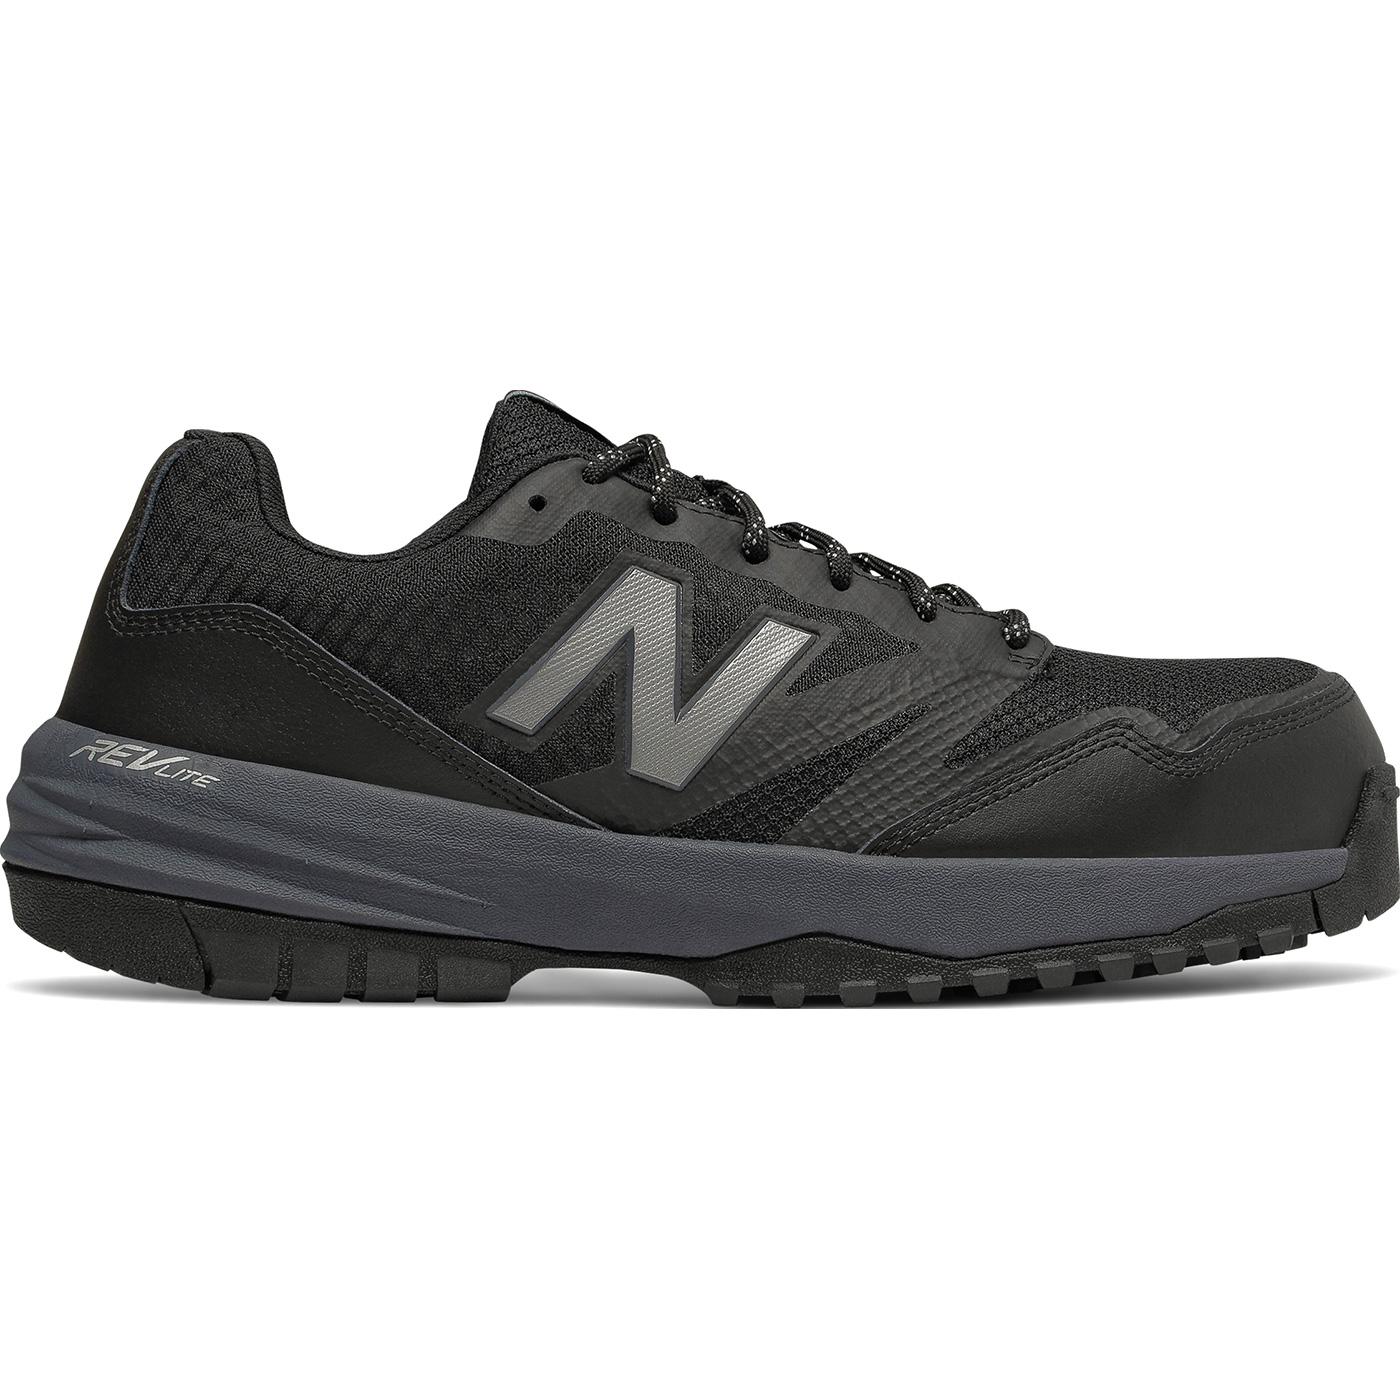 a5181cea98849 New Balance 589v1 Men's Composite Toe Electrical Hazard Athletic Work  ShoeNew Balance 589v1 Men's Composite Toe Electrical Hazard Athletic Work  Shoe,